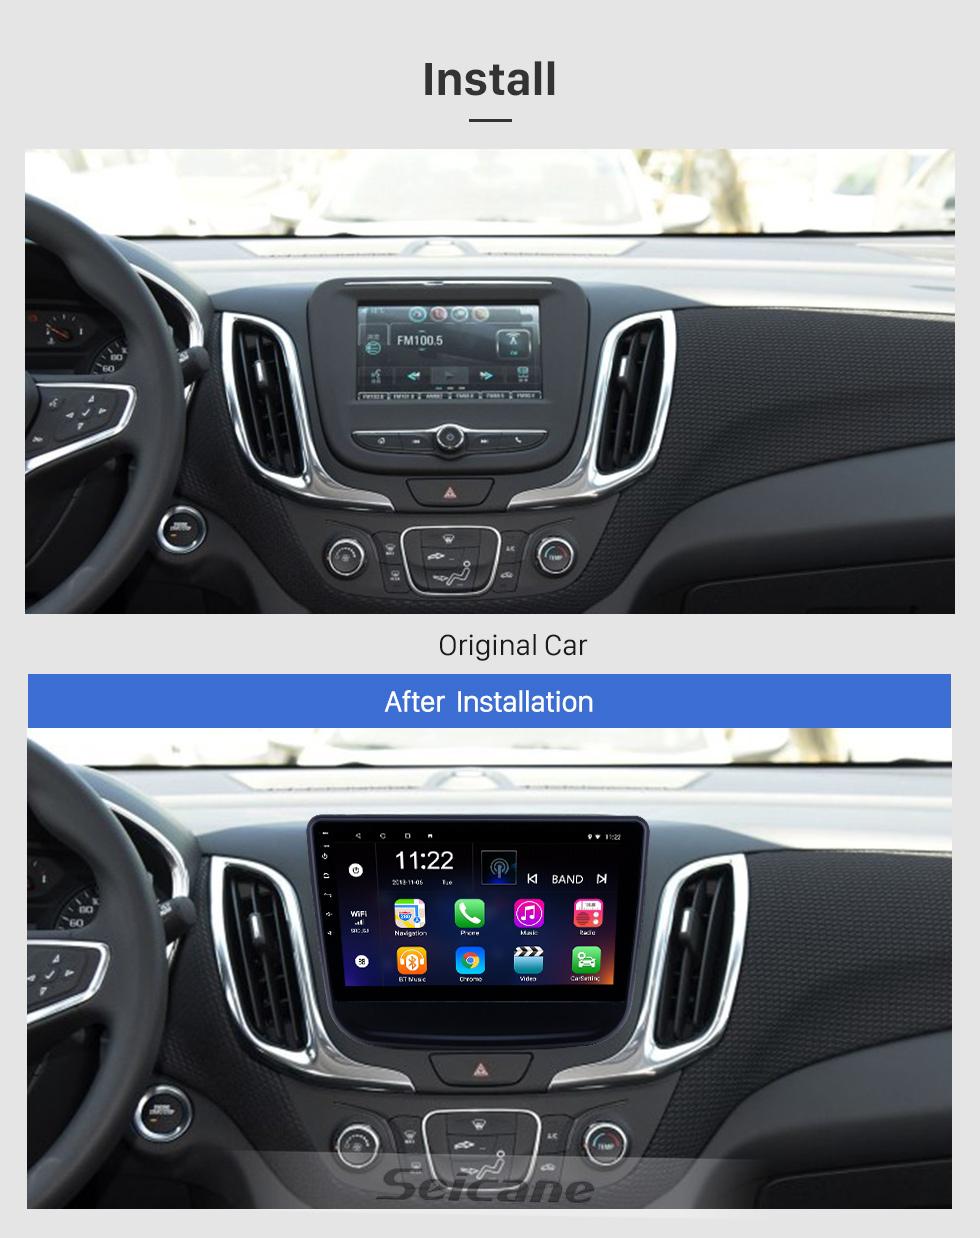 Seicane 10,1 Zoll Android 8.1 GPS-Navigationsradio für 2016-2018 Chevrolet Equinox mit HD-Touchscreen Bluetooth USB-Unterstützung Carplay TPMS